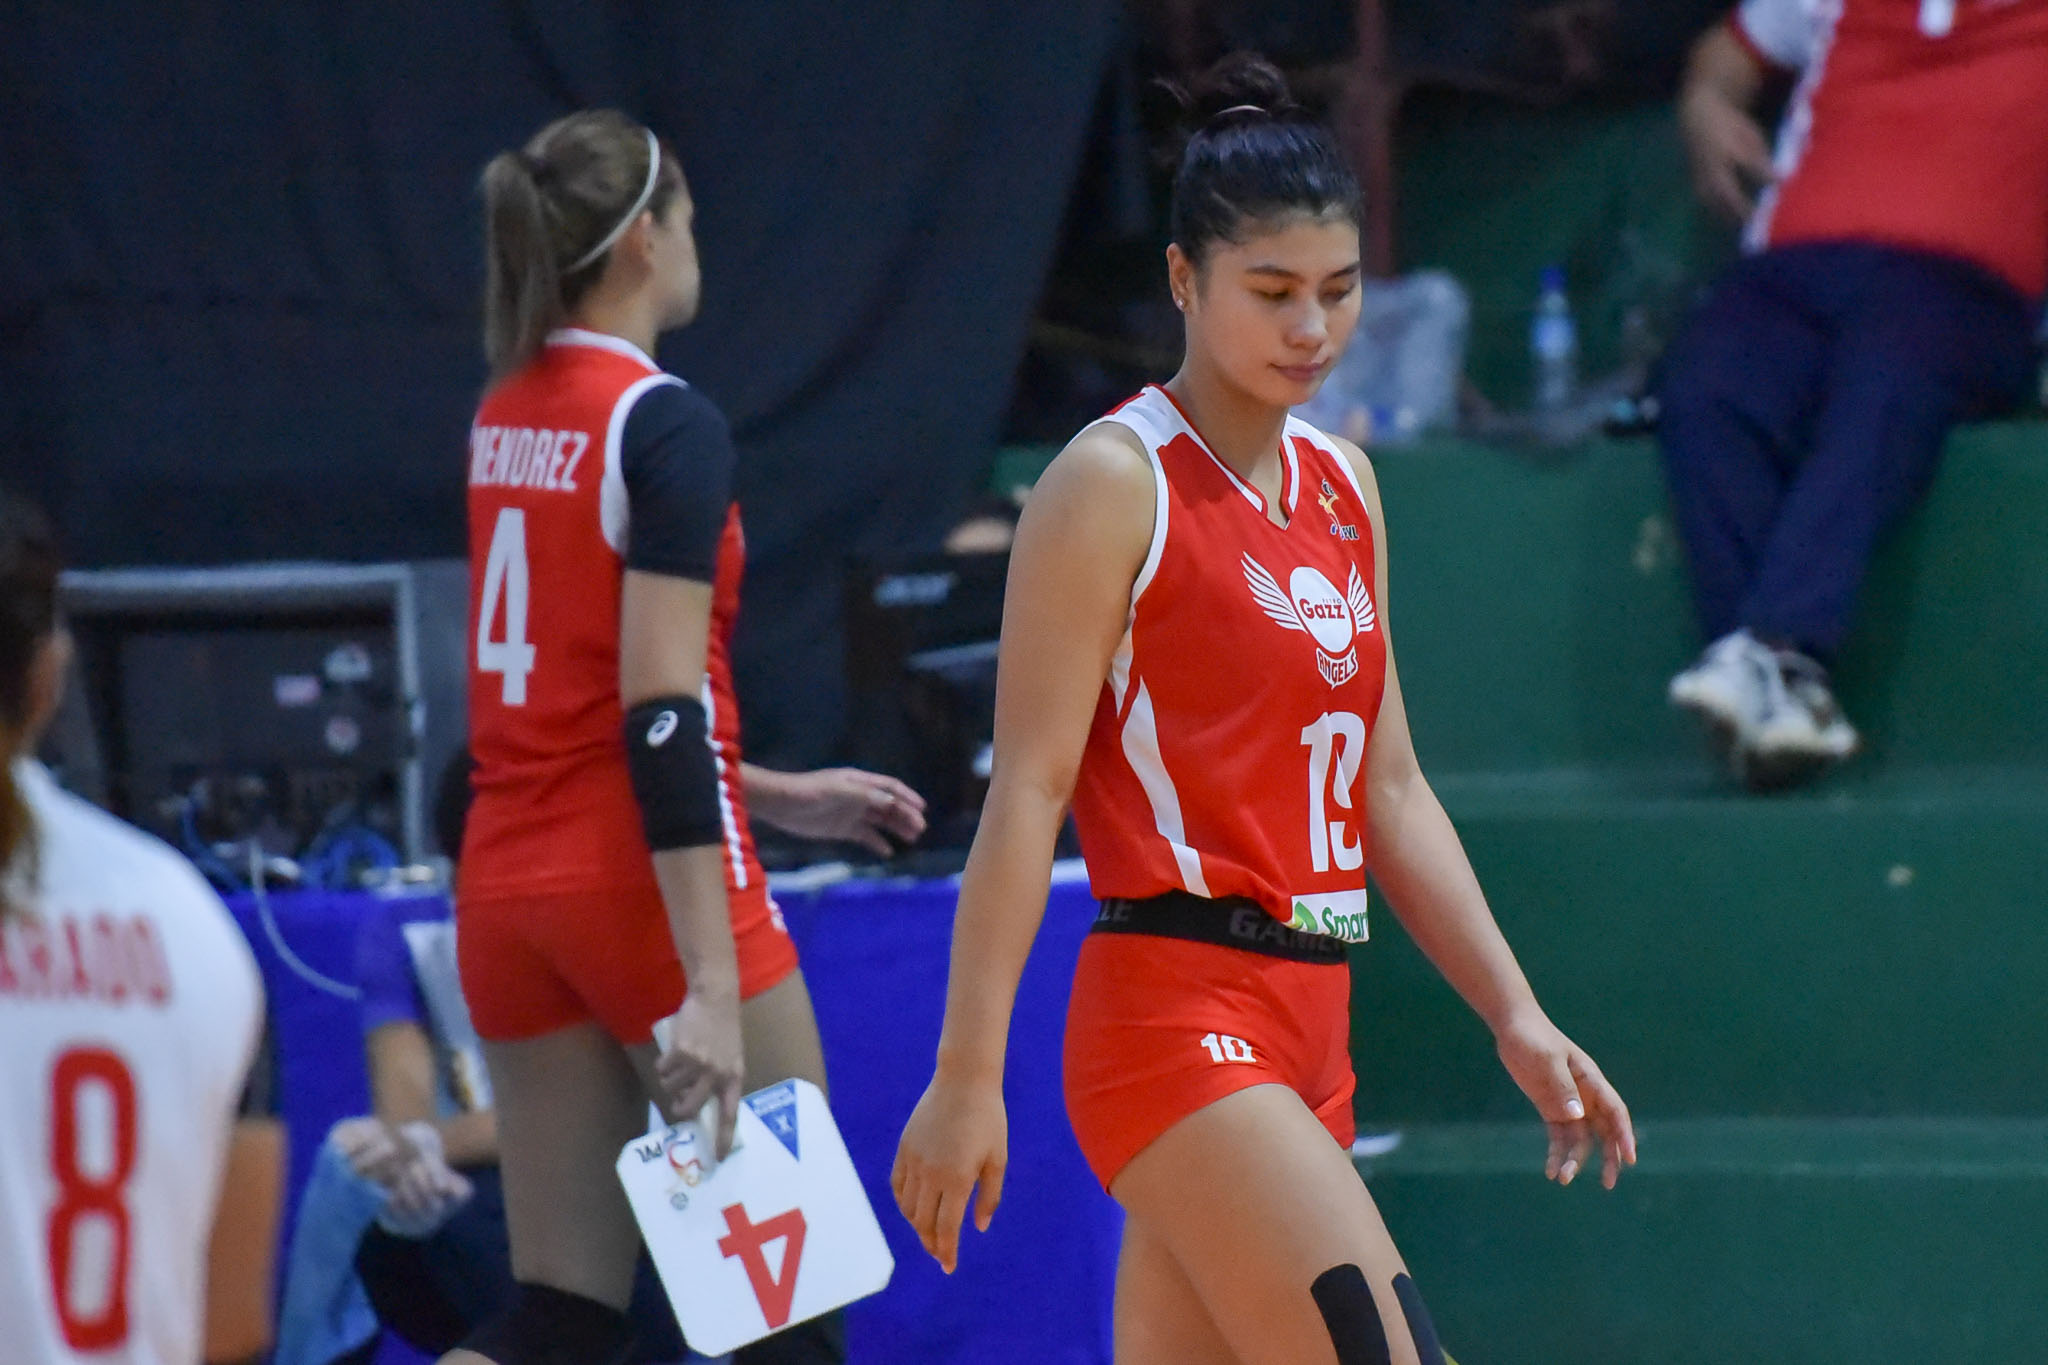 2021-PVL-Open-Petrogazz-vs.-Creamline-Semis-G2-Myla-Pablo-3276 Petro Gazz never reached peak in PVL bubble, laments Laniog News PVL Volleyball  - philippine sports news